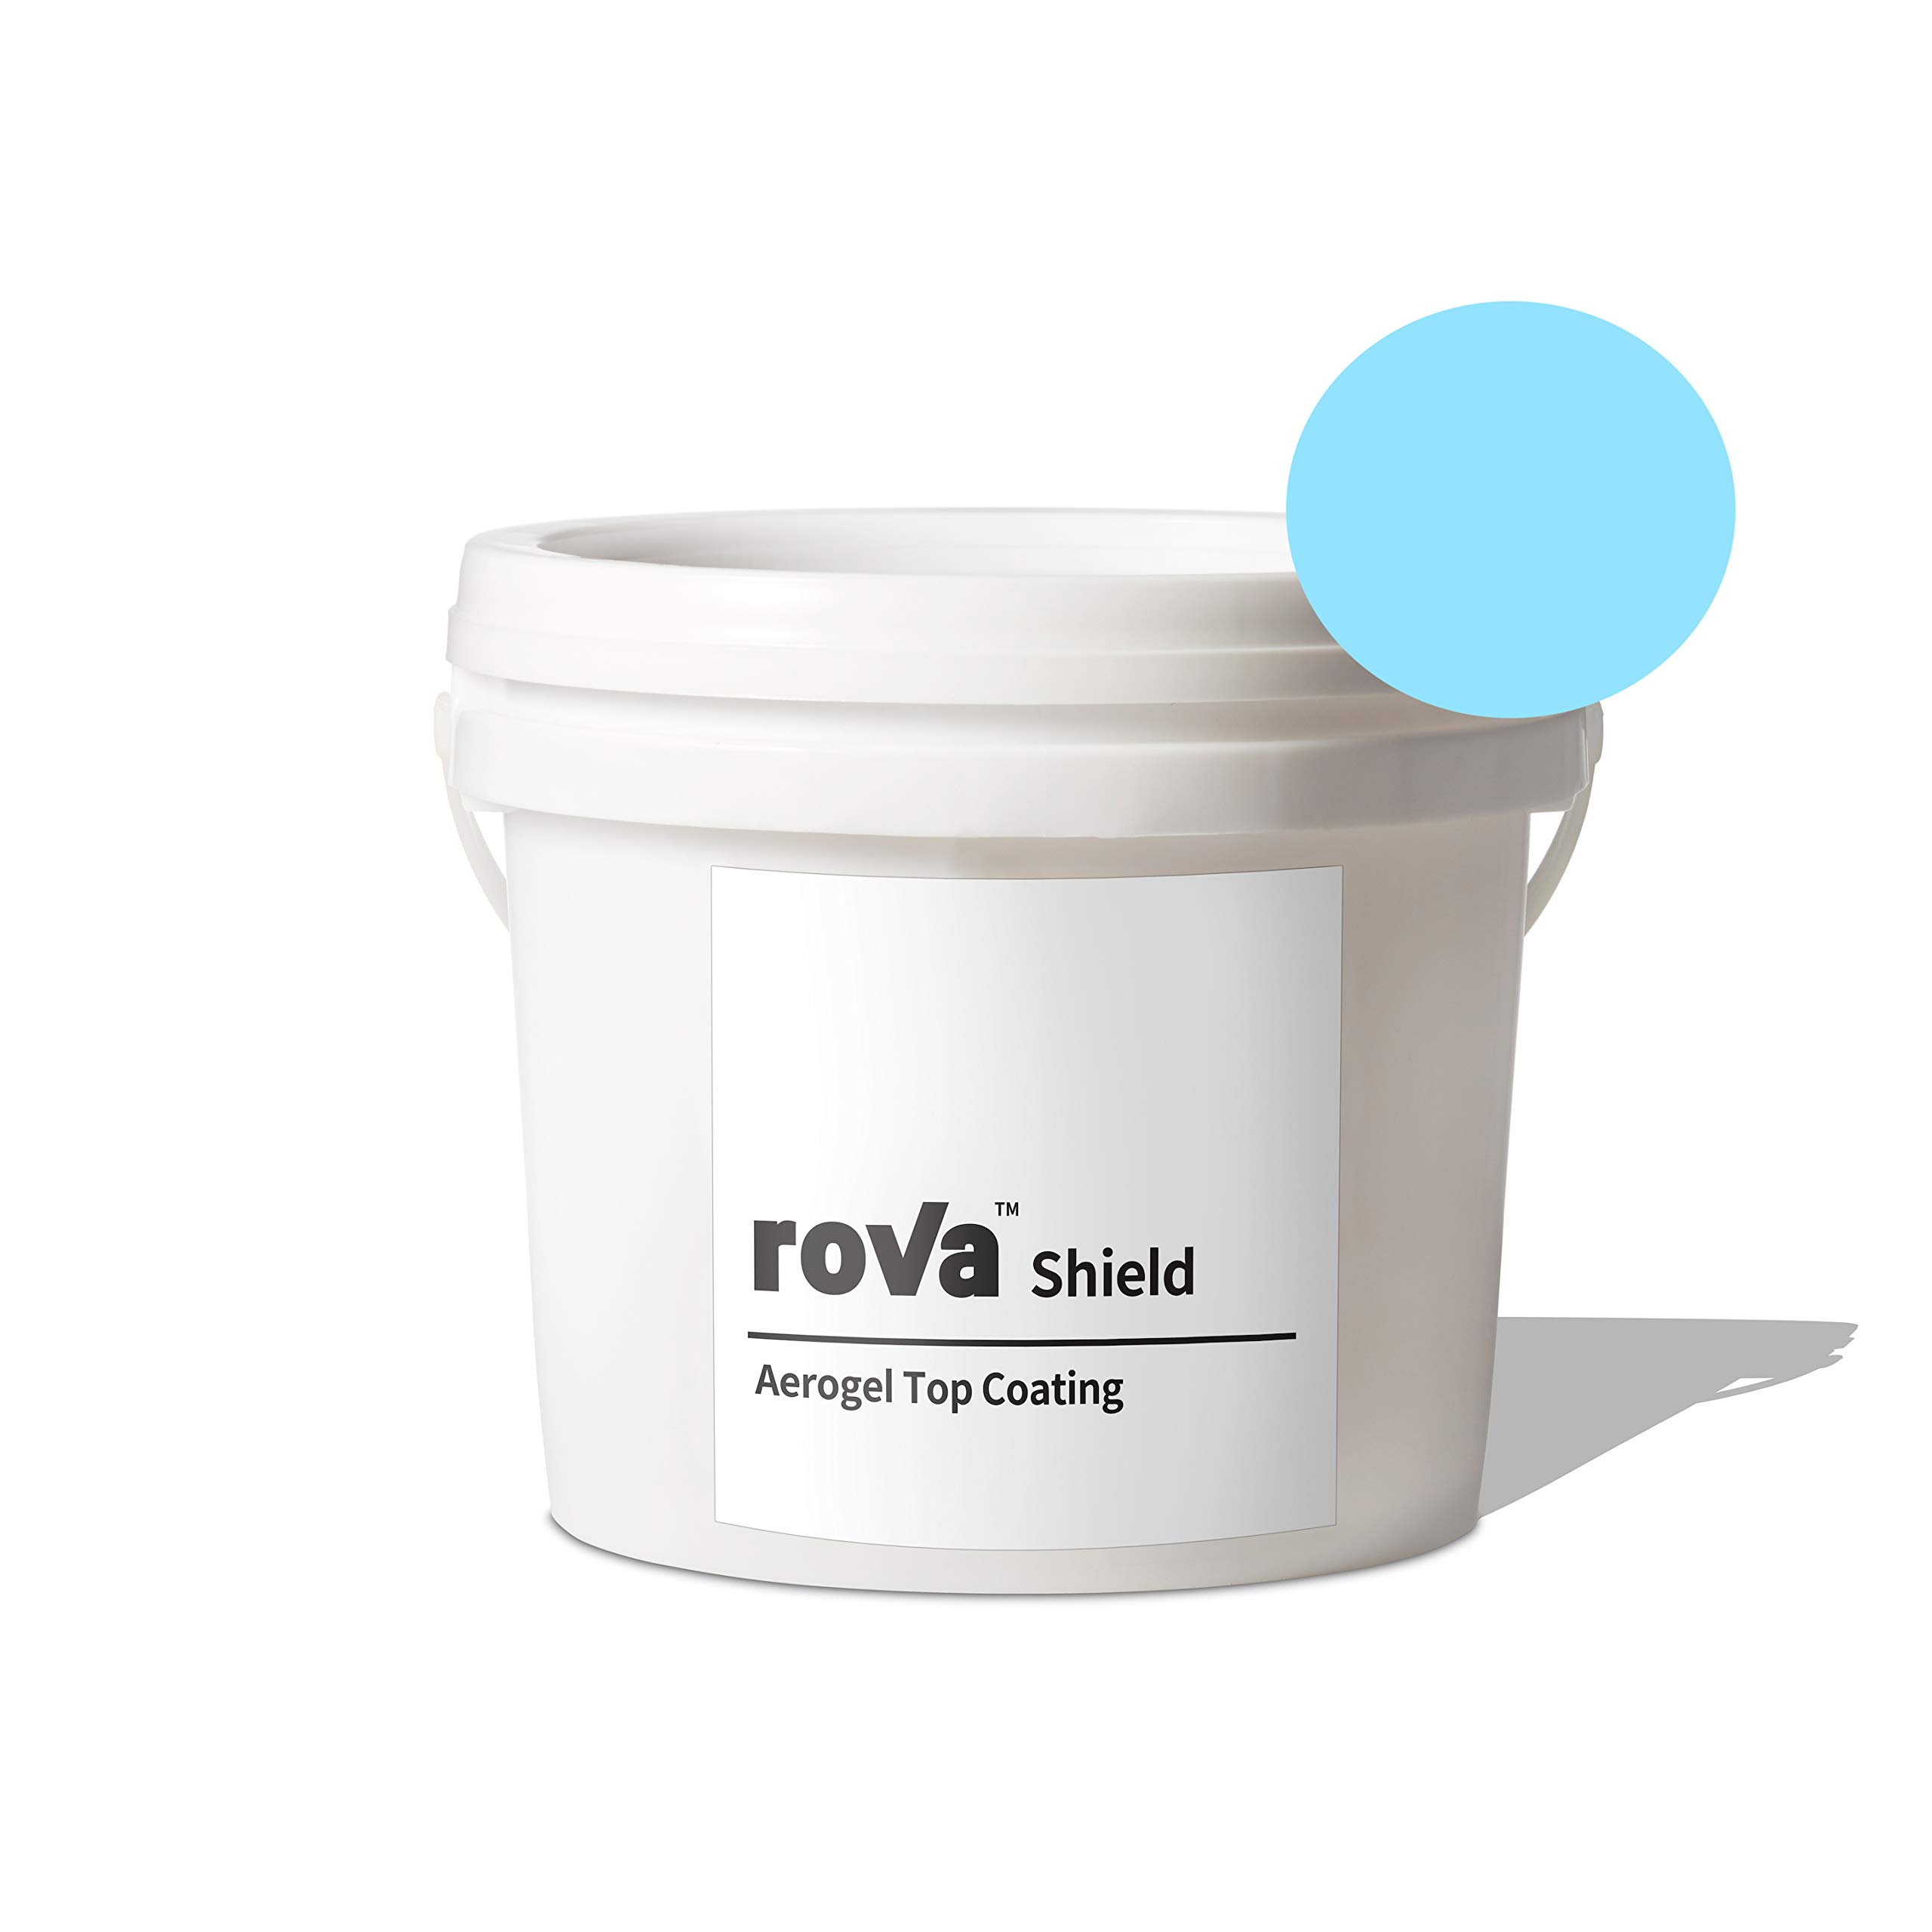 roVa Shield Aerogel Top Coating, Color Skyblue 1 Quart (1 Liter) by roVa (Image #1)